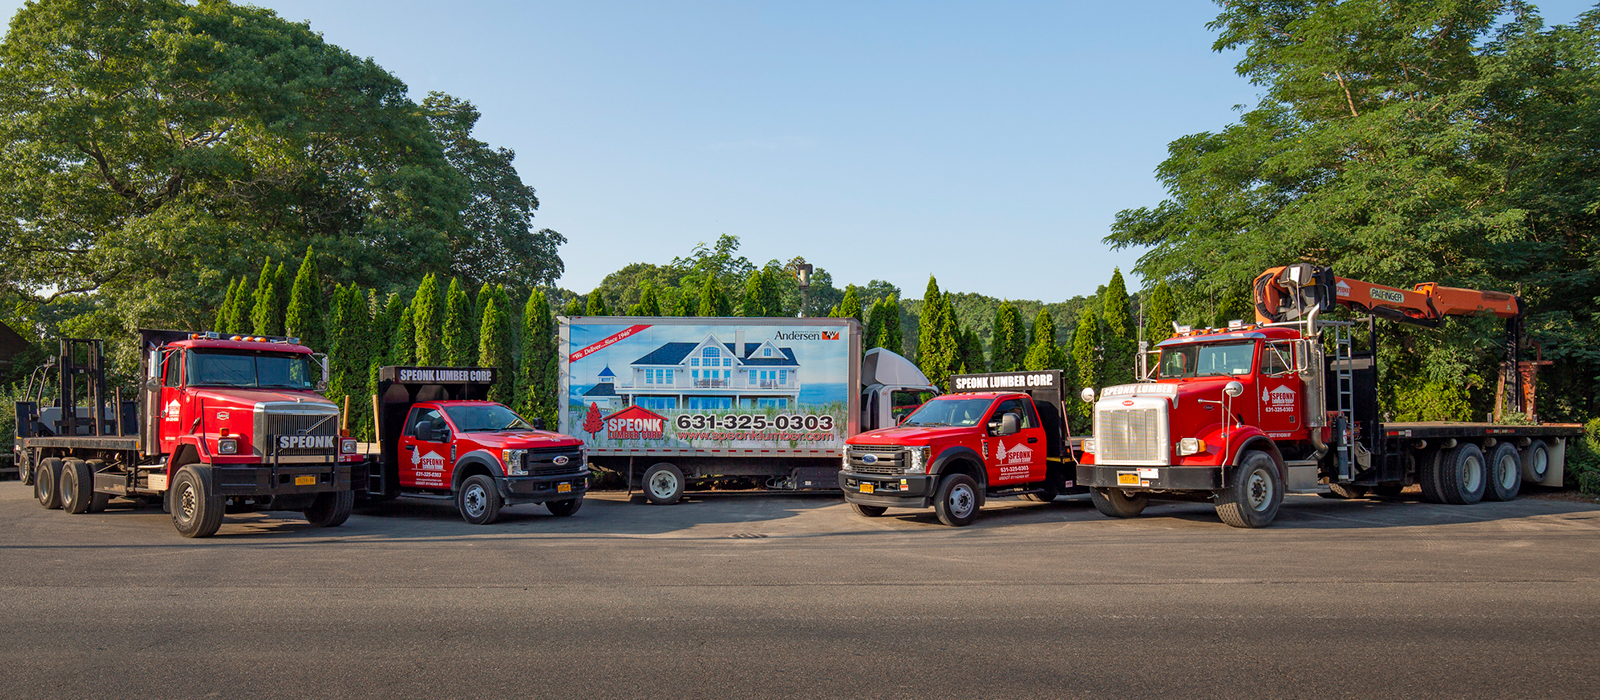 Speonk trucks